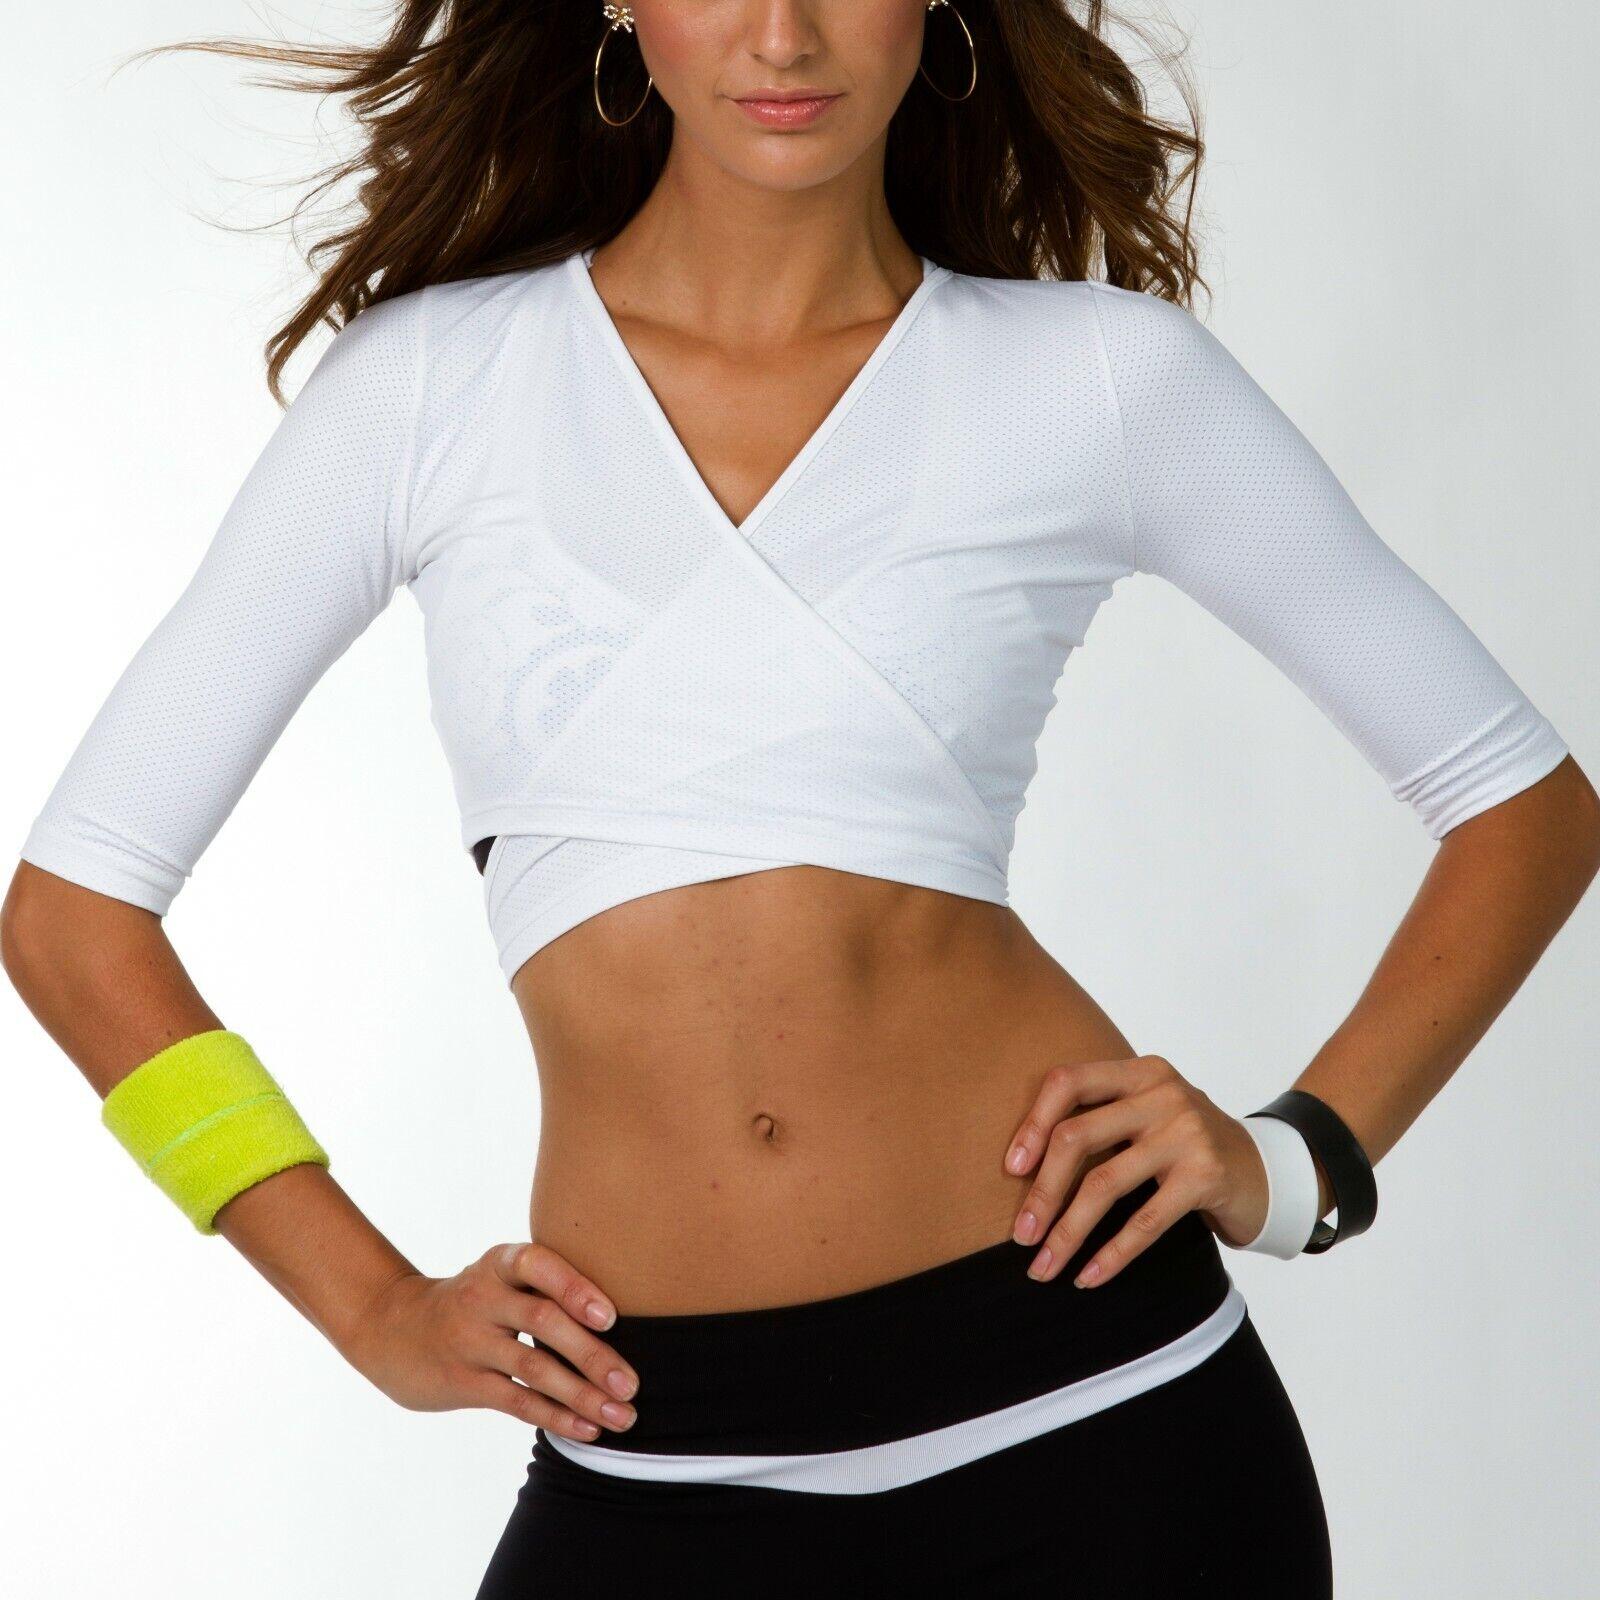 Sports Wrap Cropped Mesh Top XS-S White Womens Brazilian Supplex Athletic Gym